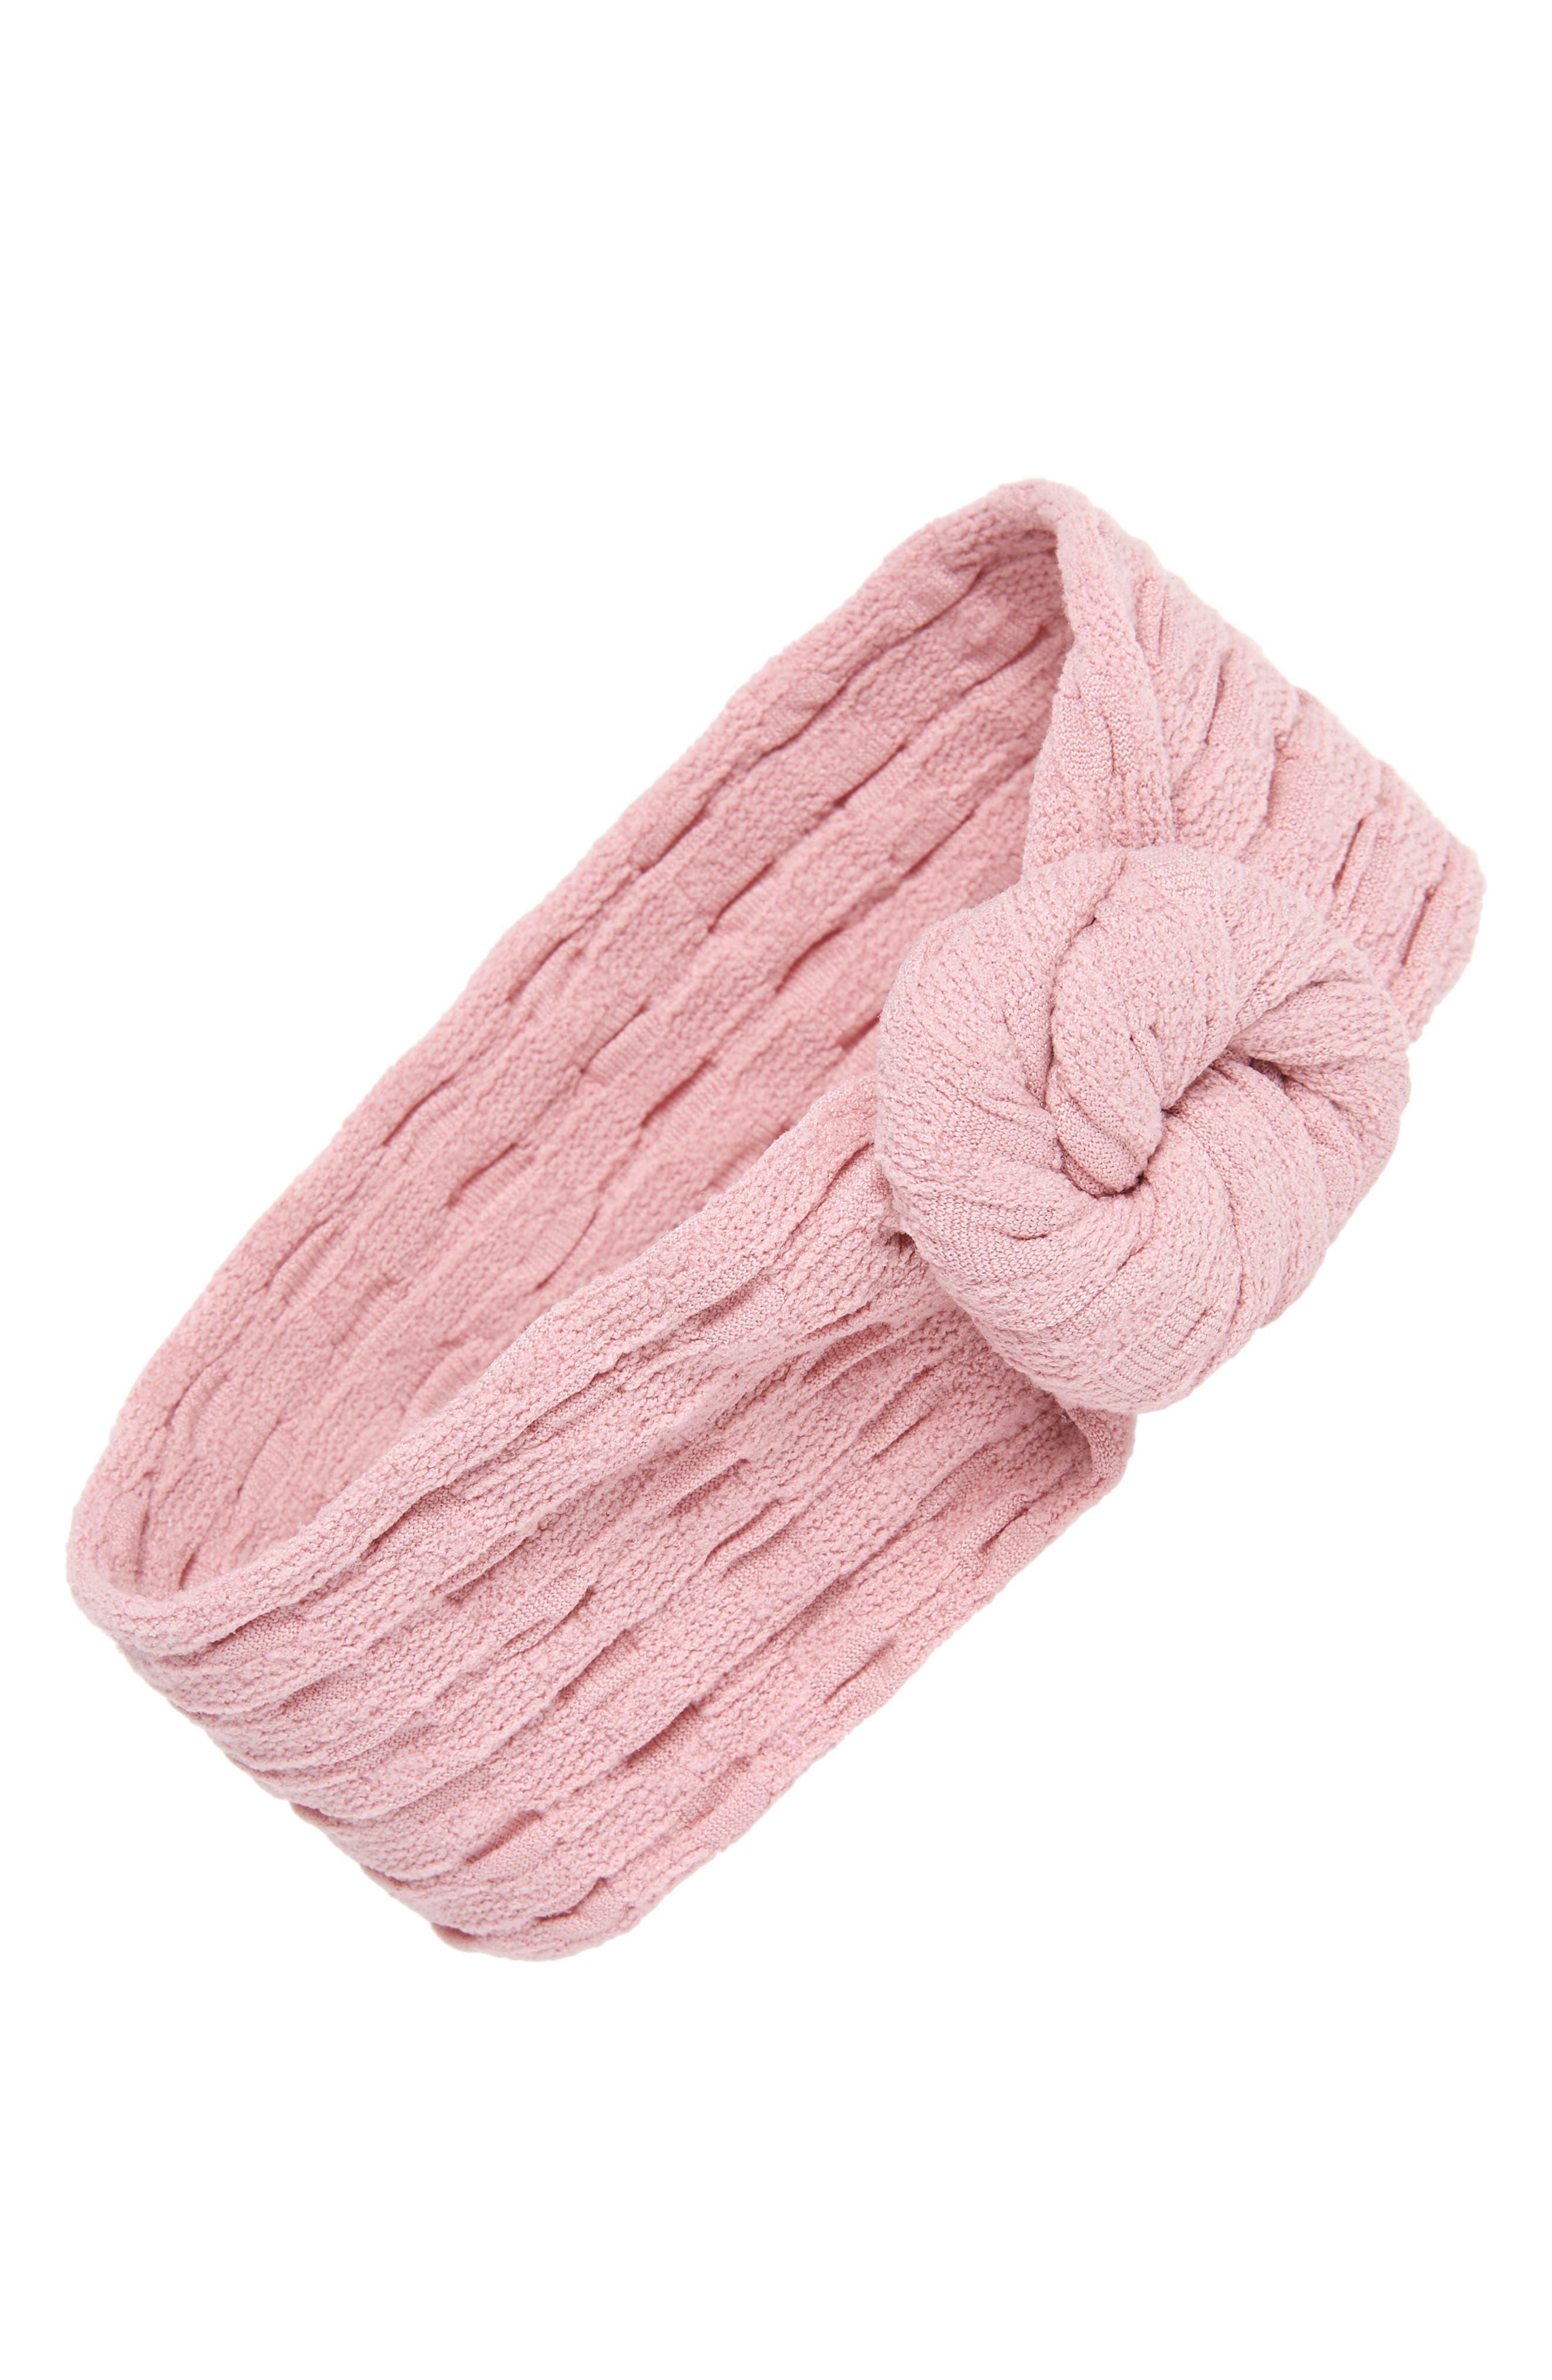 BABY BLING Waffle Bun Headband, Main, color, 650